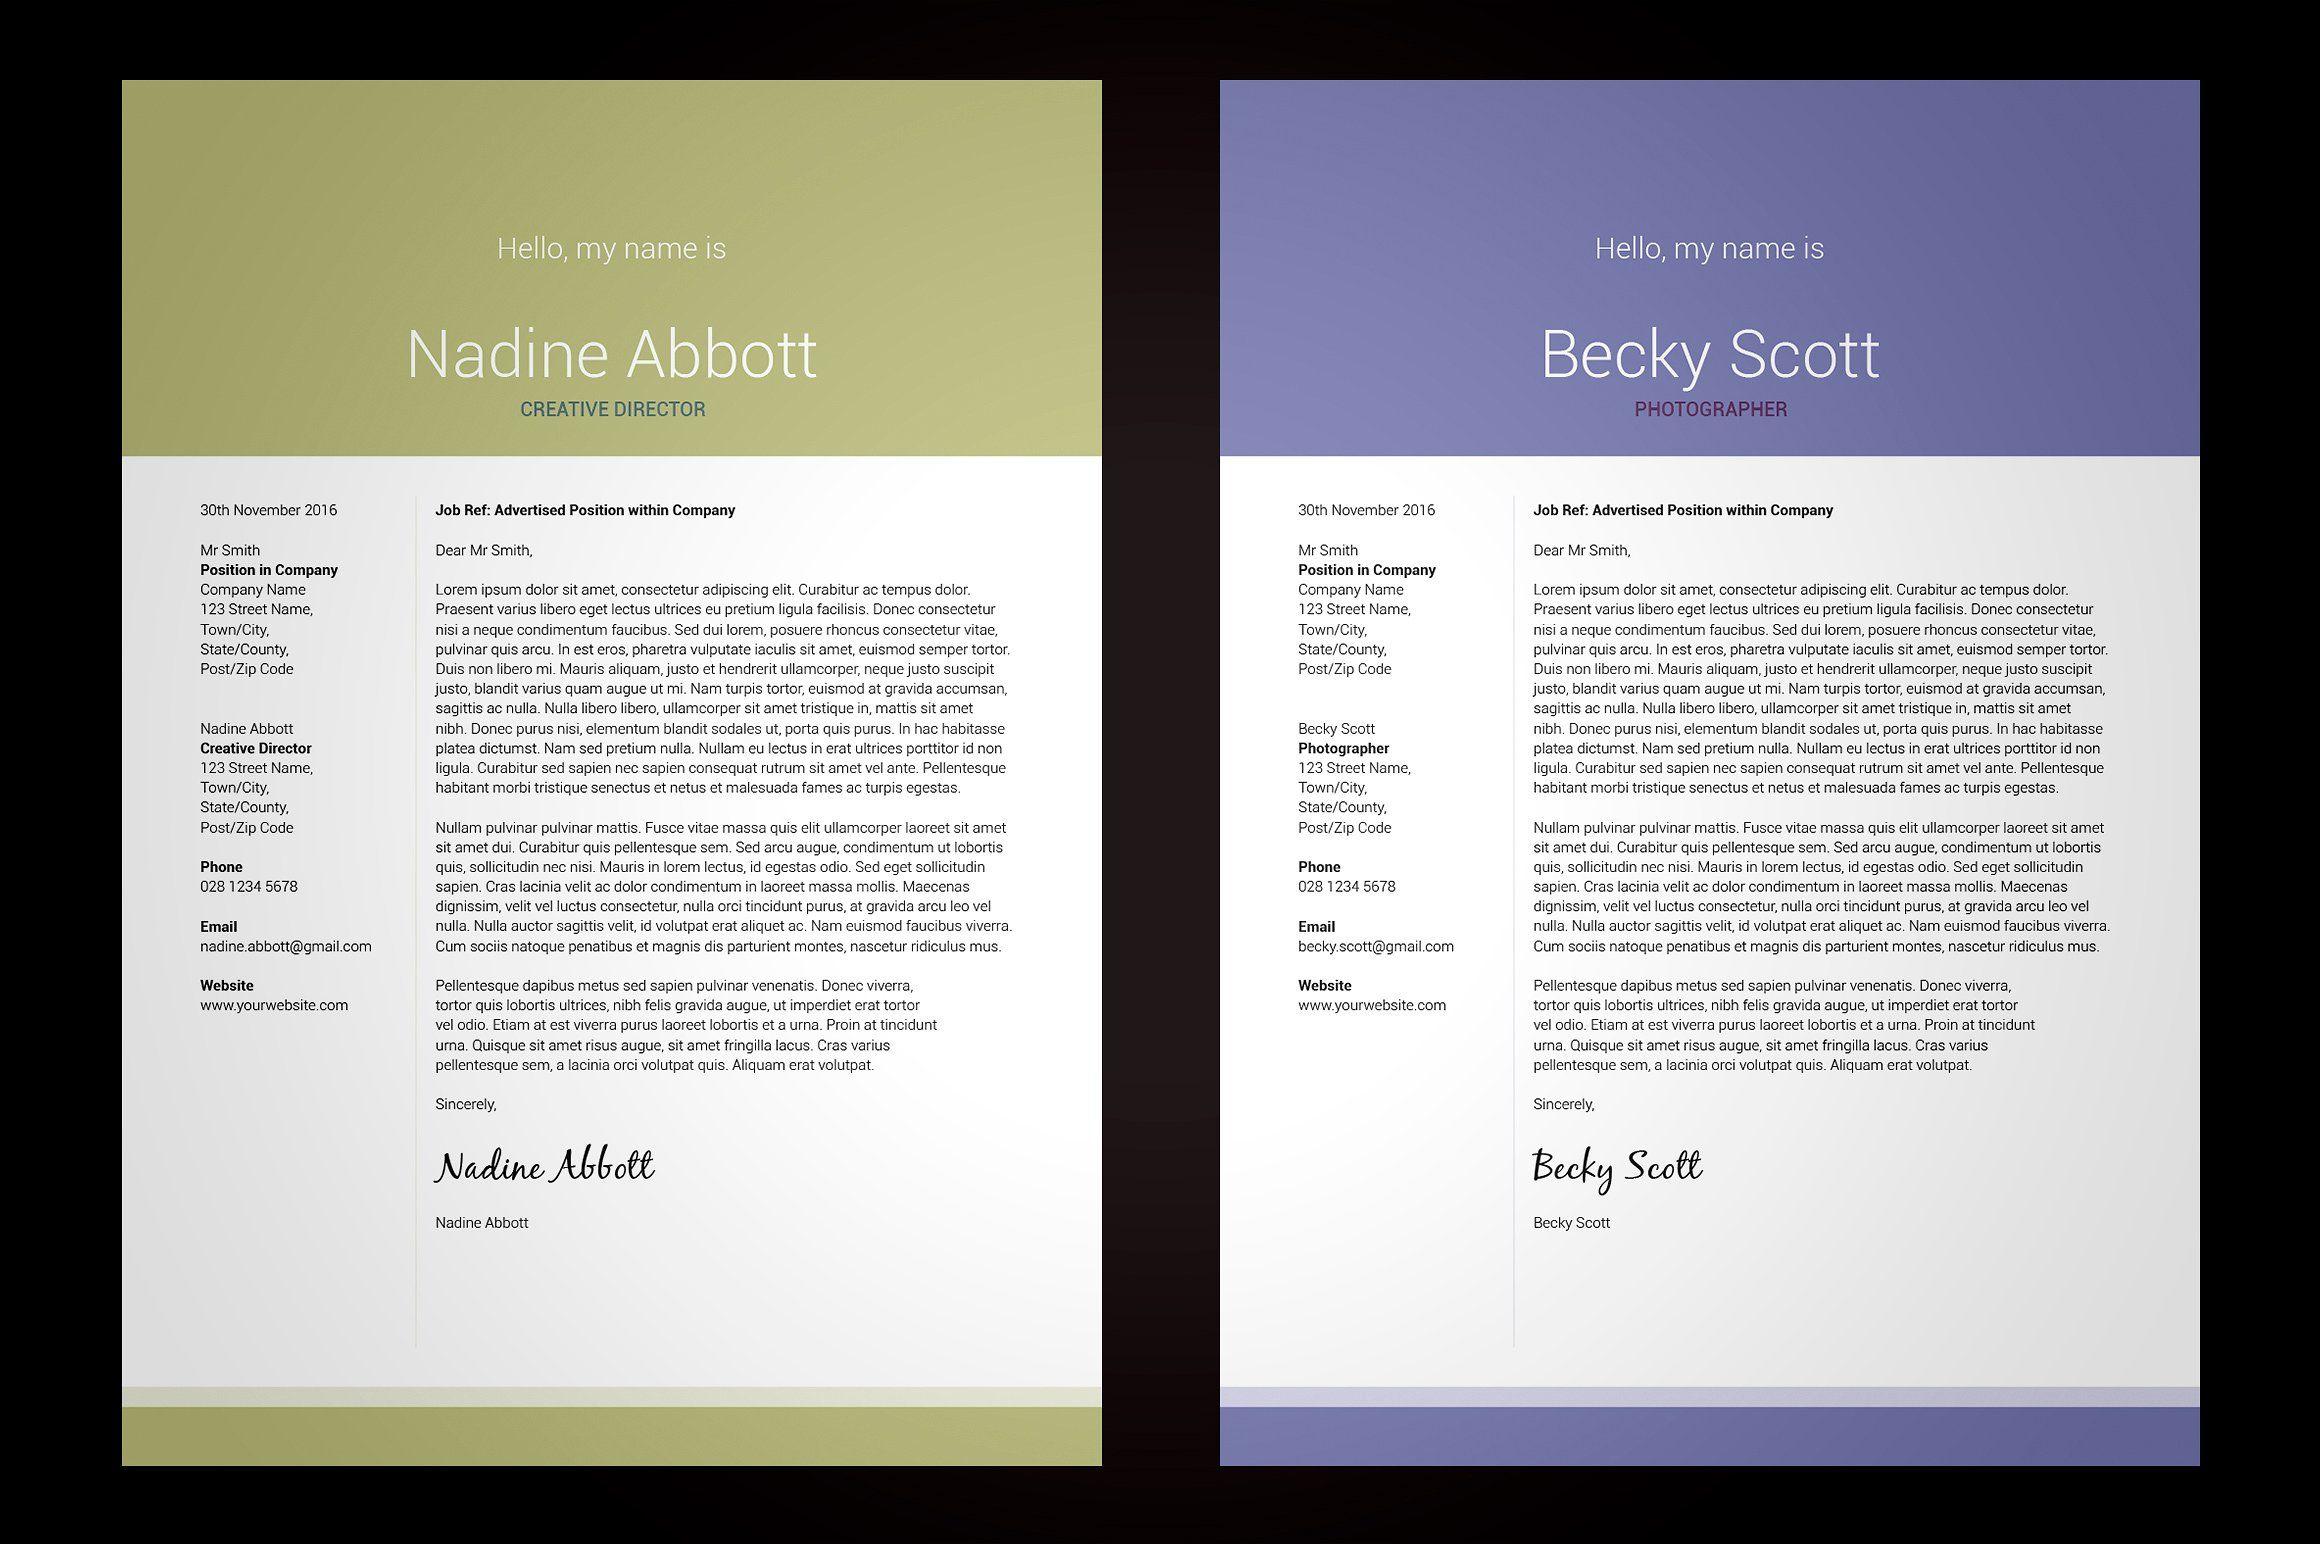 My Resume V3 Indesign resume template, Microsoft word